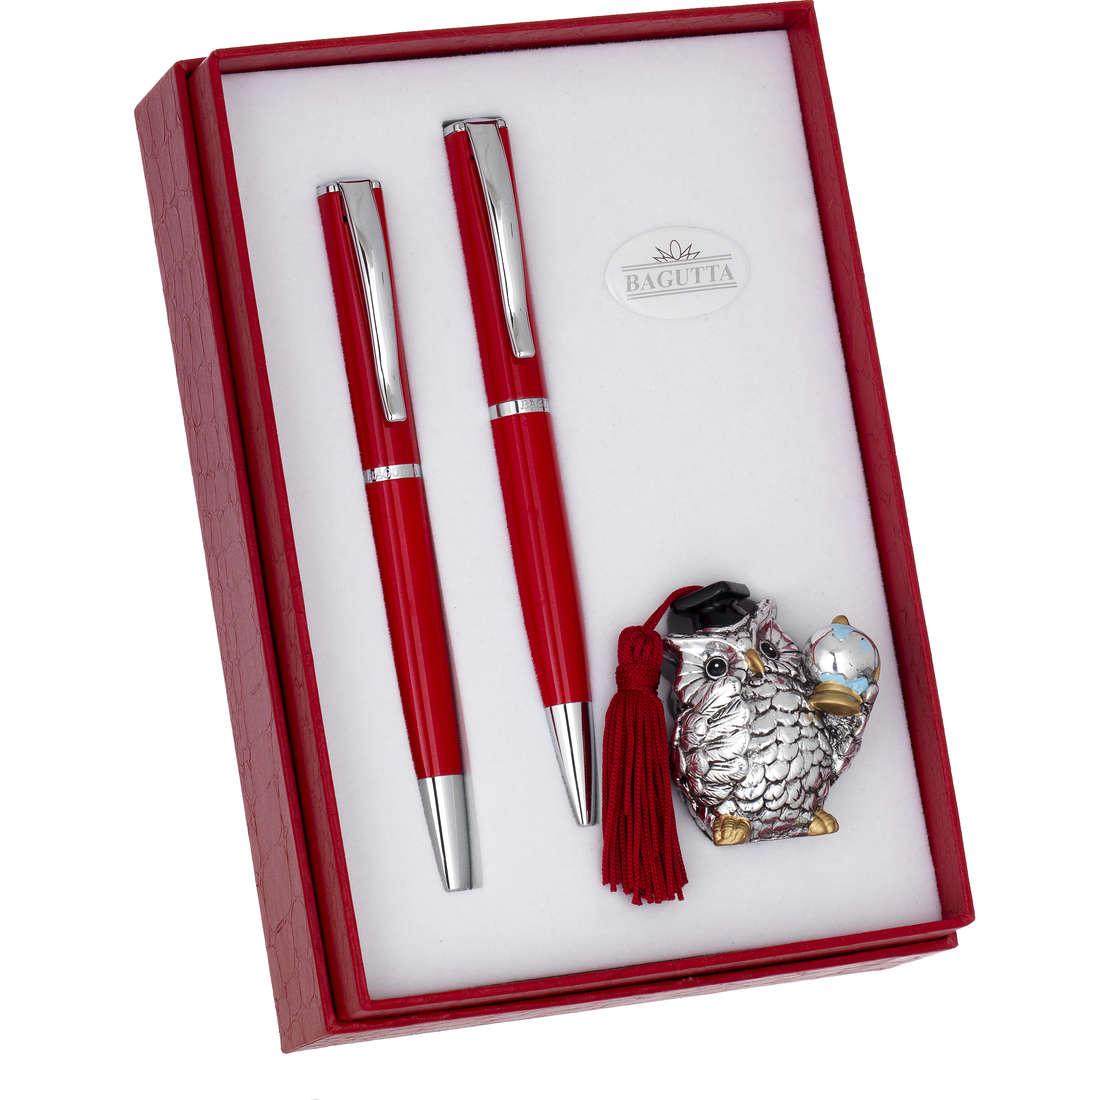 stylo unisex bijoux Bagutta 1902-05